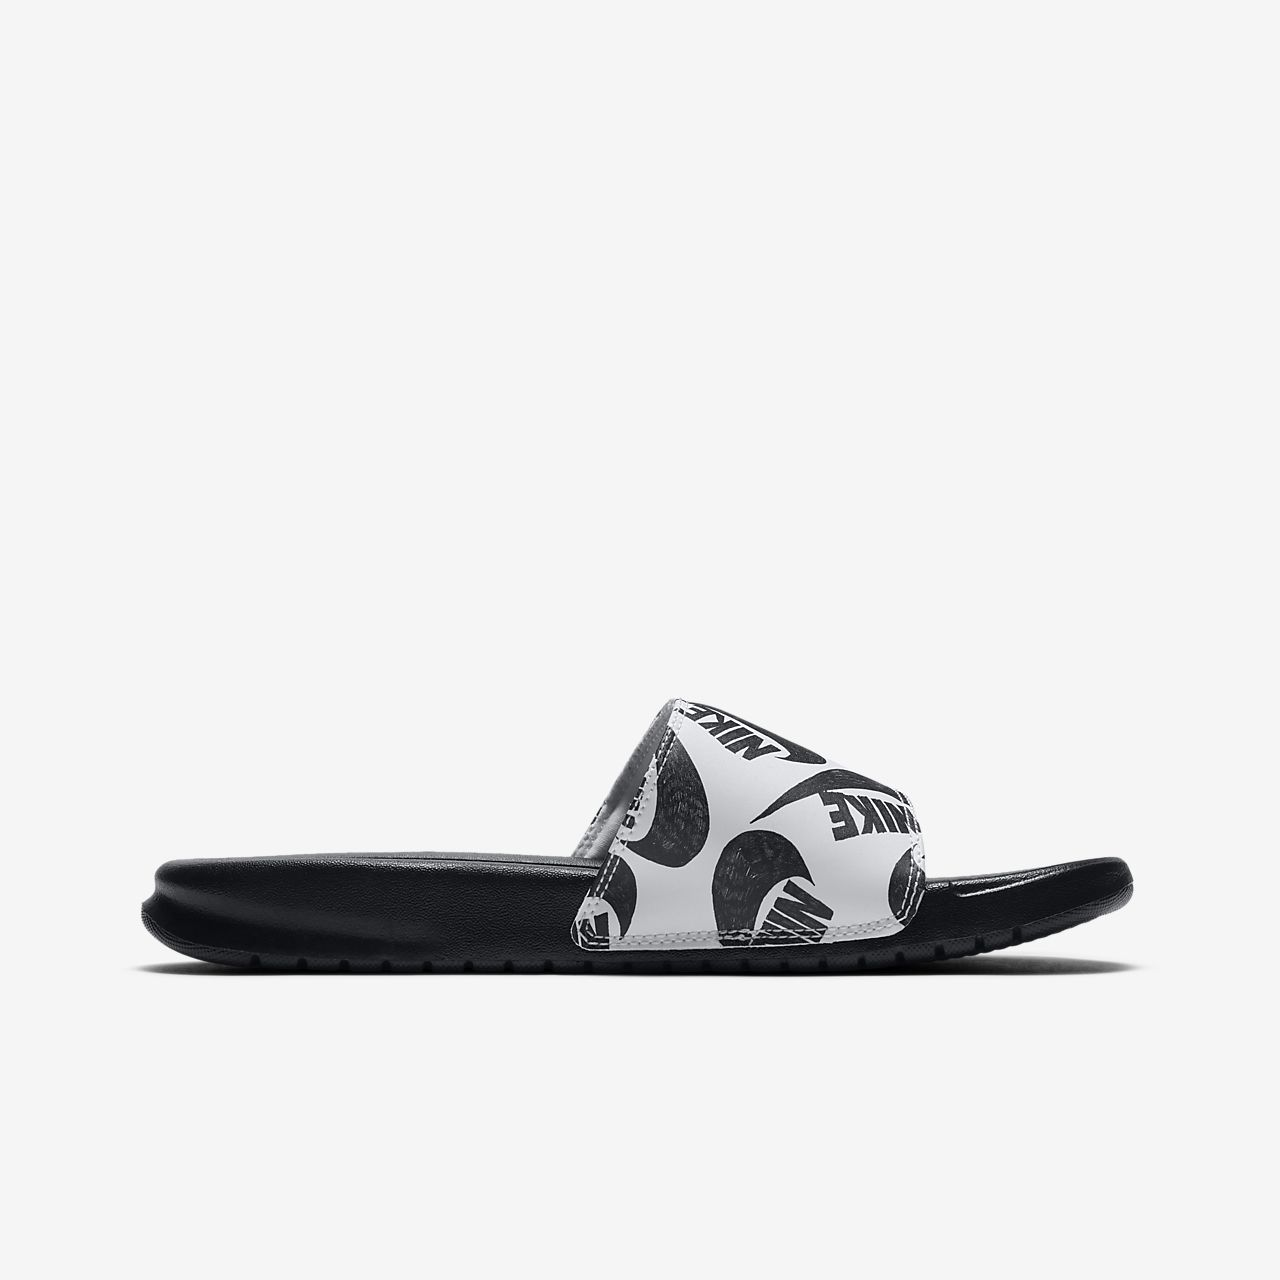 Nike noi women s nike solay thong sandal papucs szandal.html